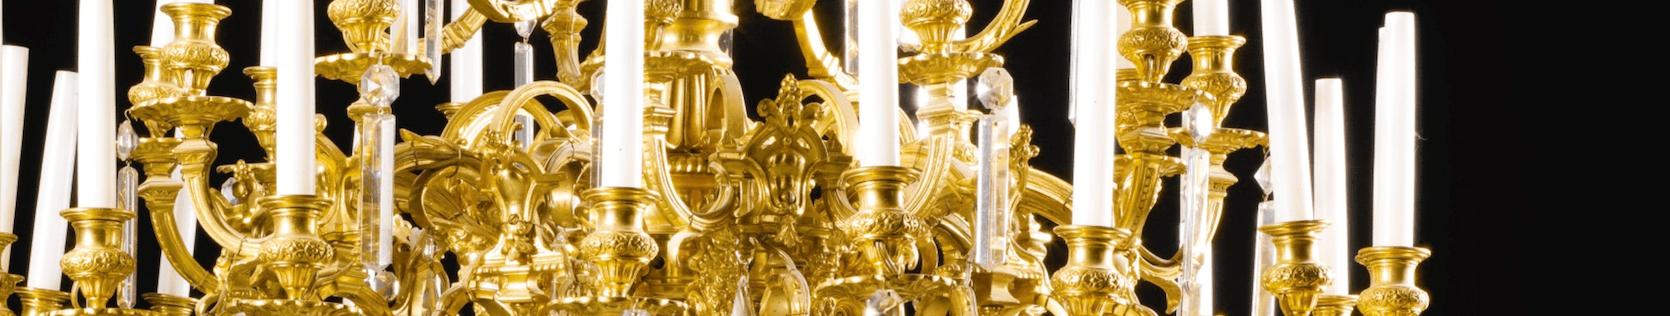 антикварные люстры из бронзы